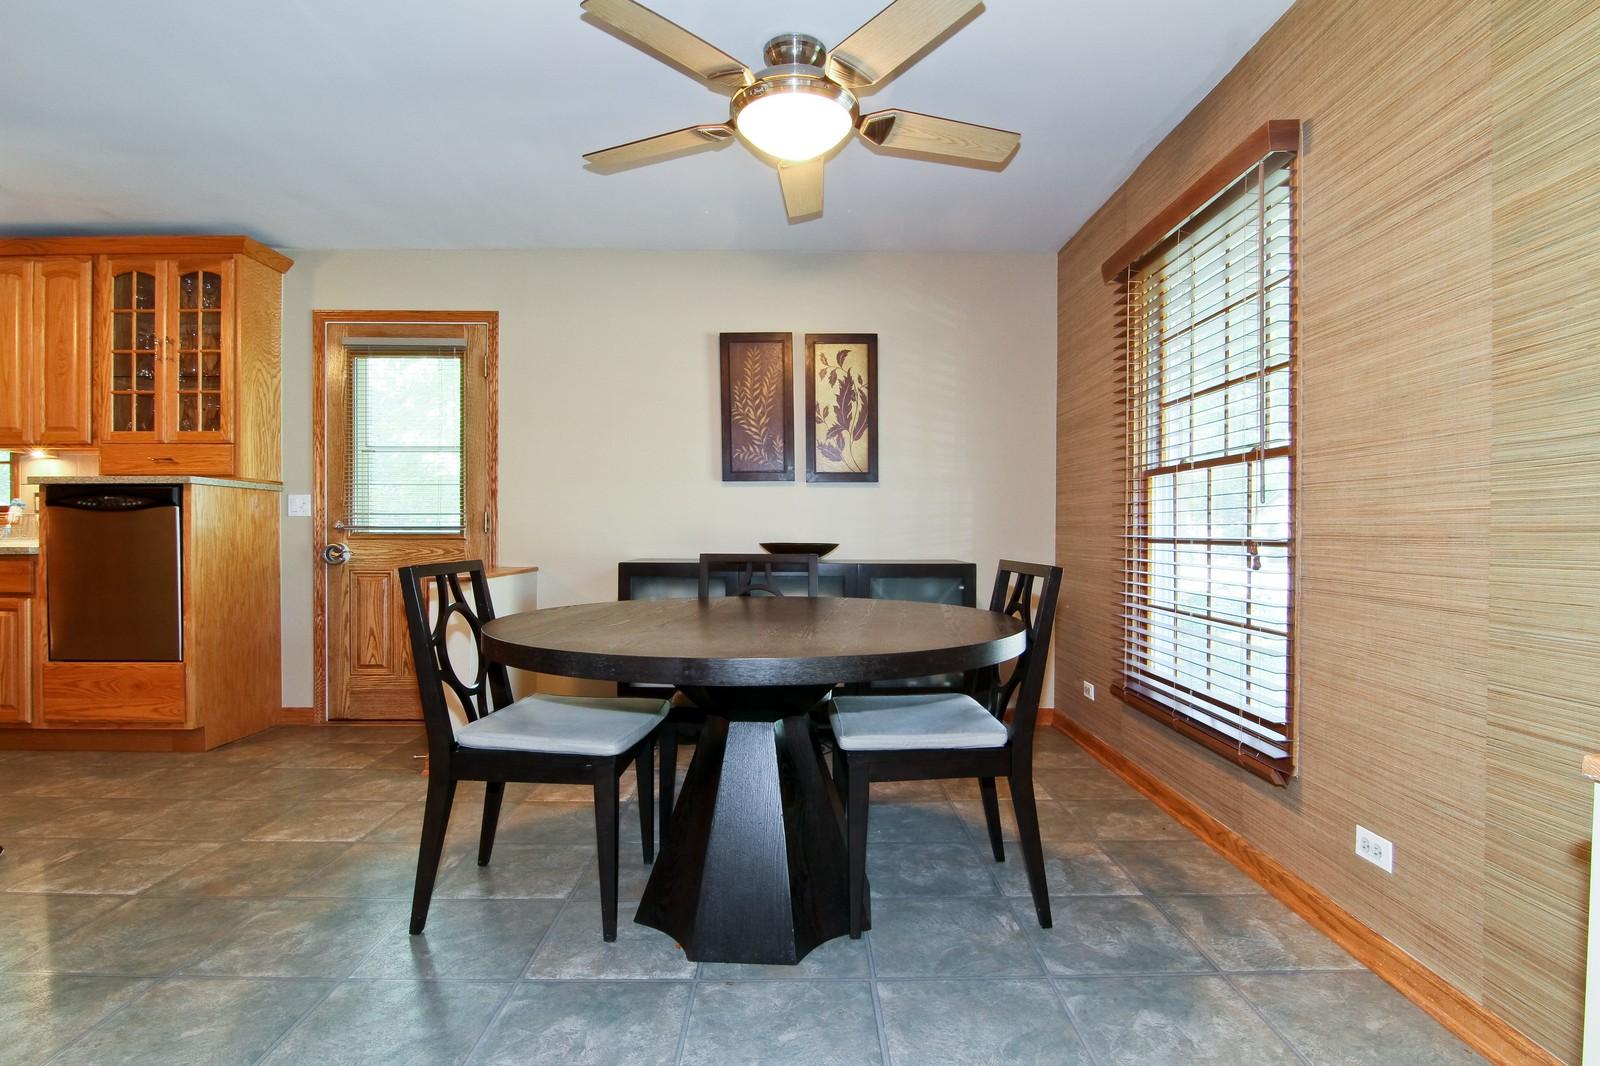 Real Estate Photography - 89 N Ott, Glen Ellyn, IL, 60137 - Dining Room